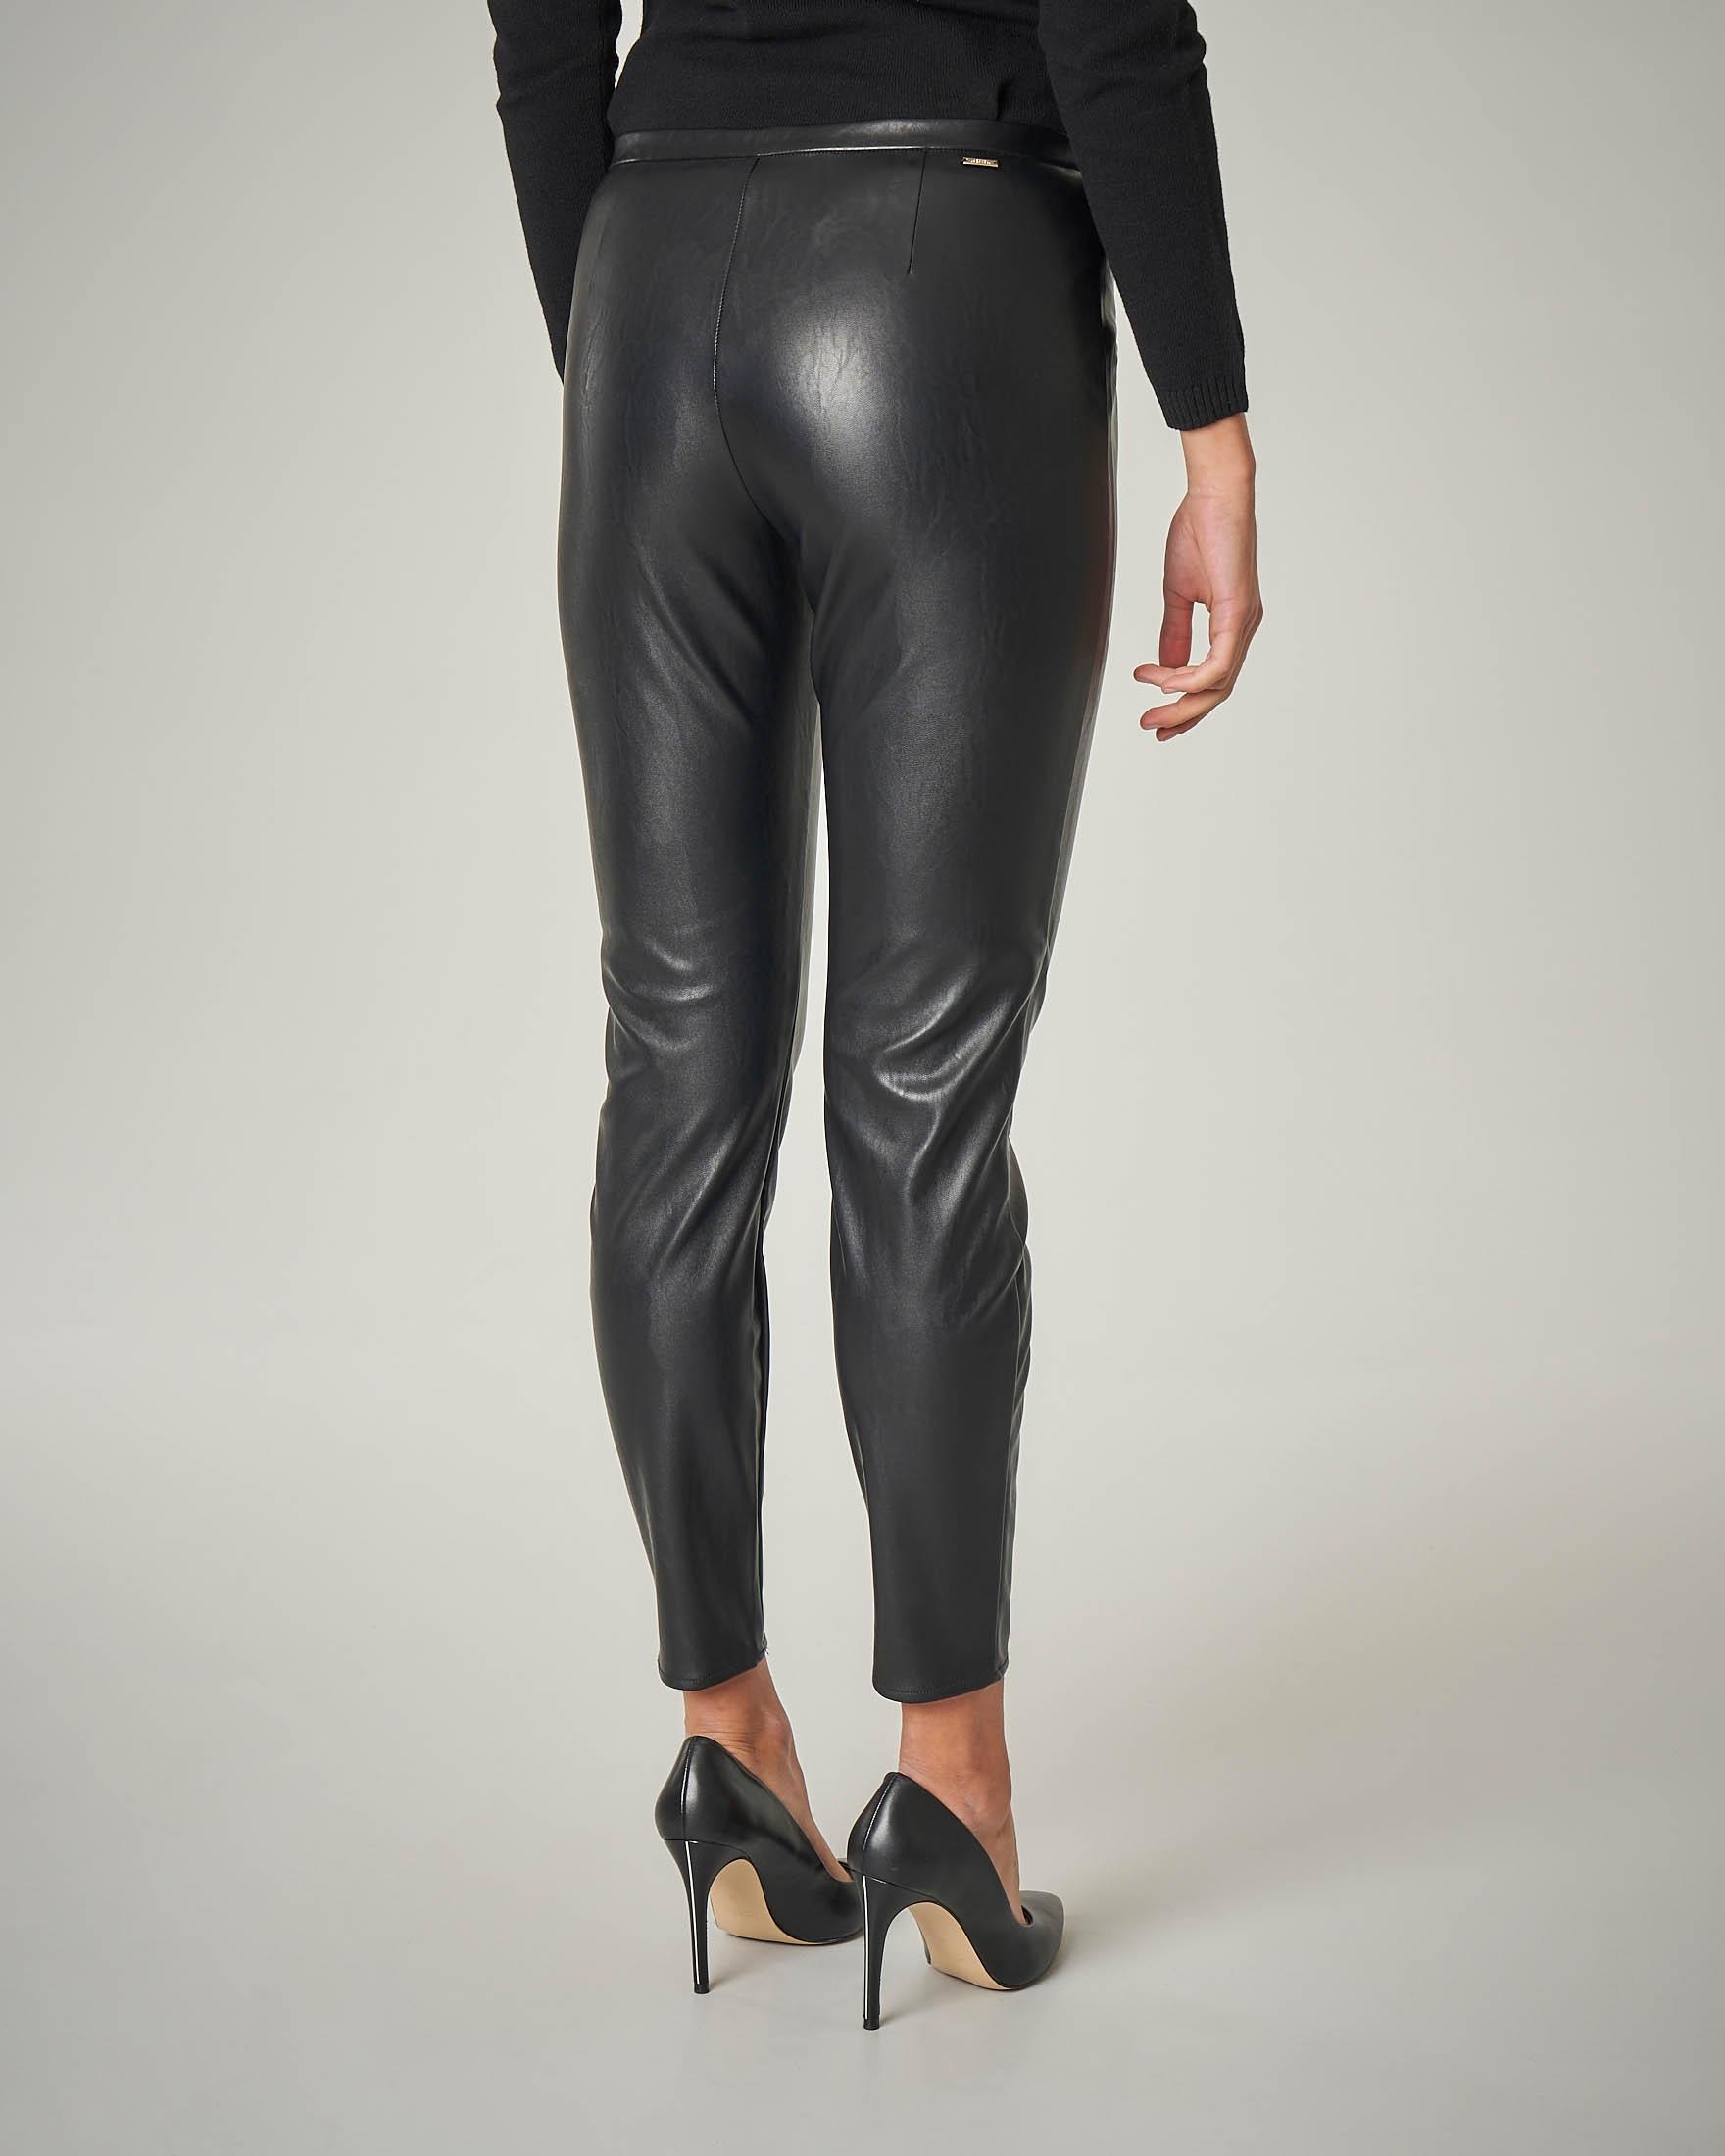 Pantaloni neri in ecopelle